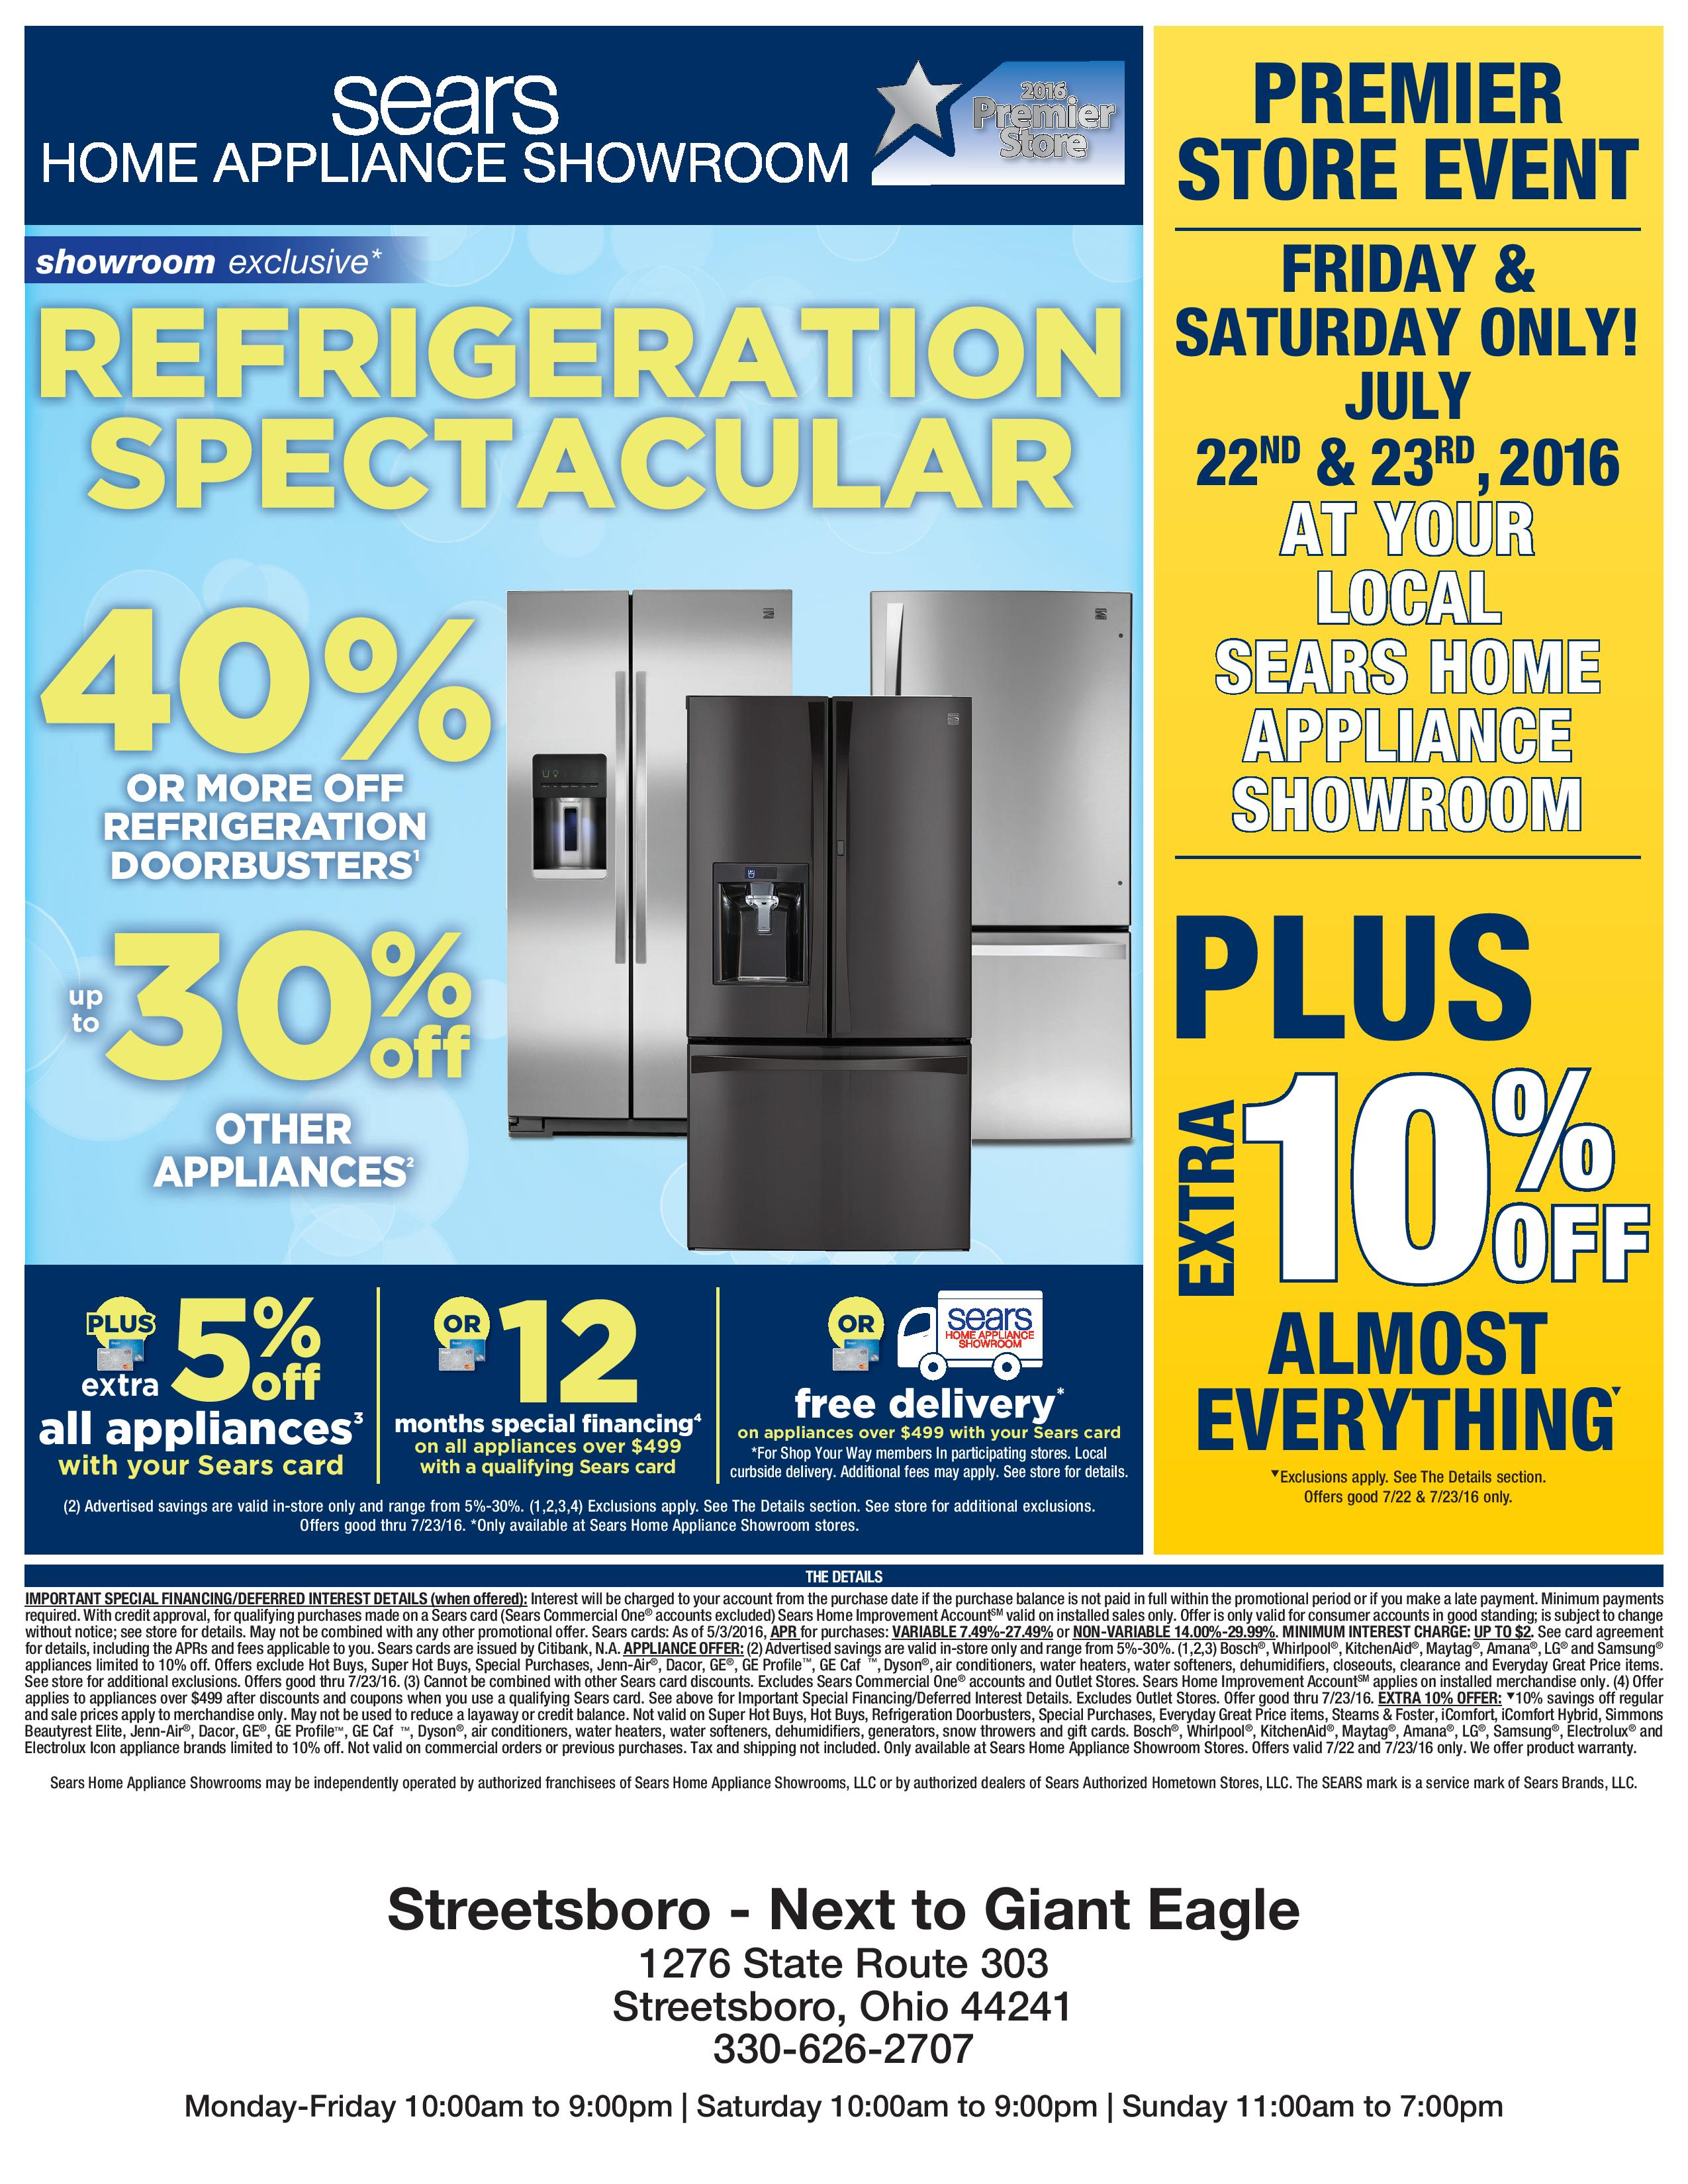 2016 Member Event Sears Home Appliance Showroom Premier